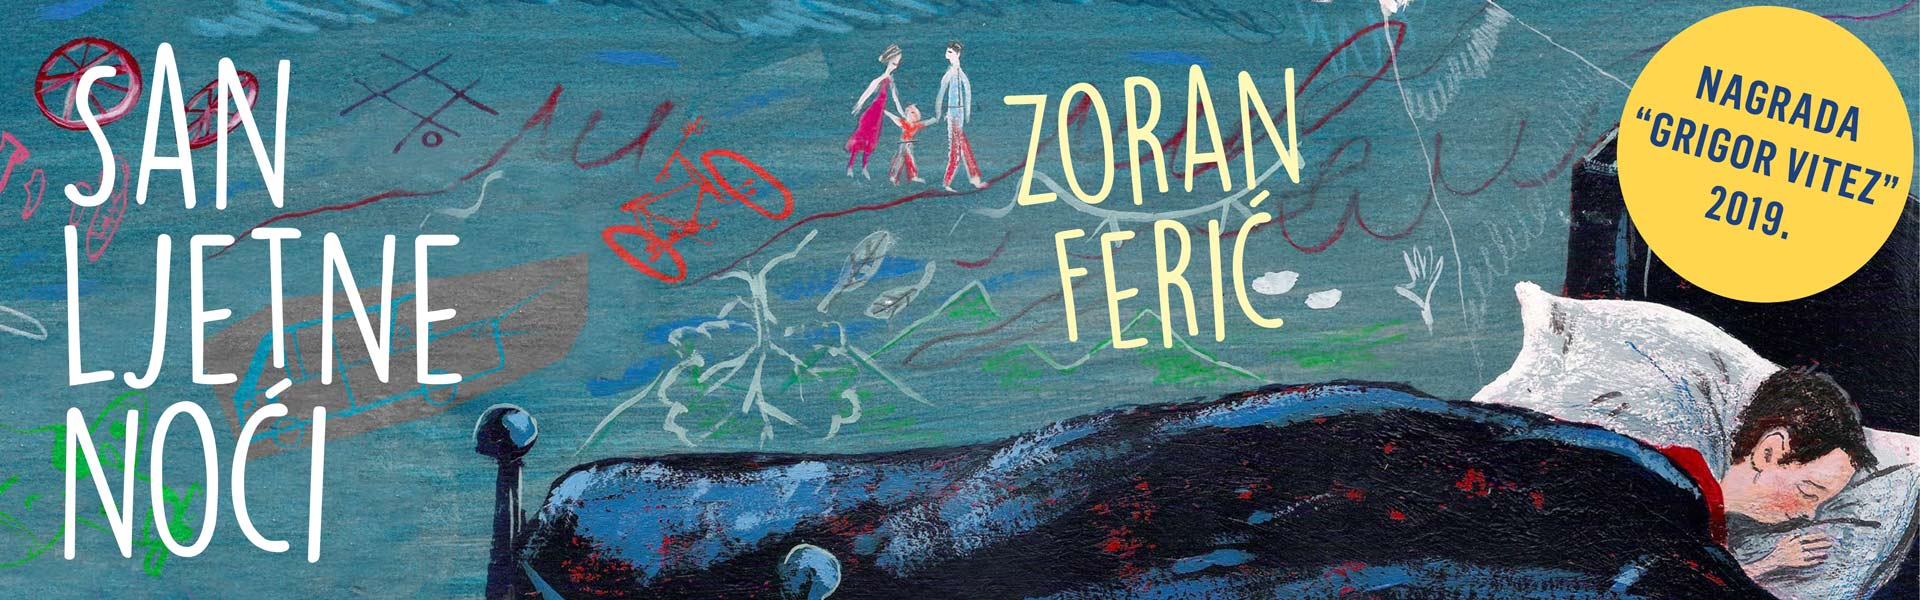 Zoran Ferić dobio nagradu 'Grigor Vitez'